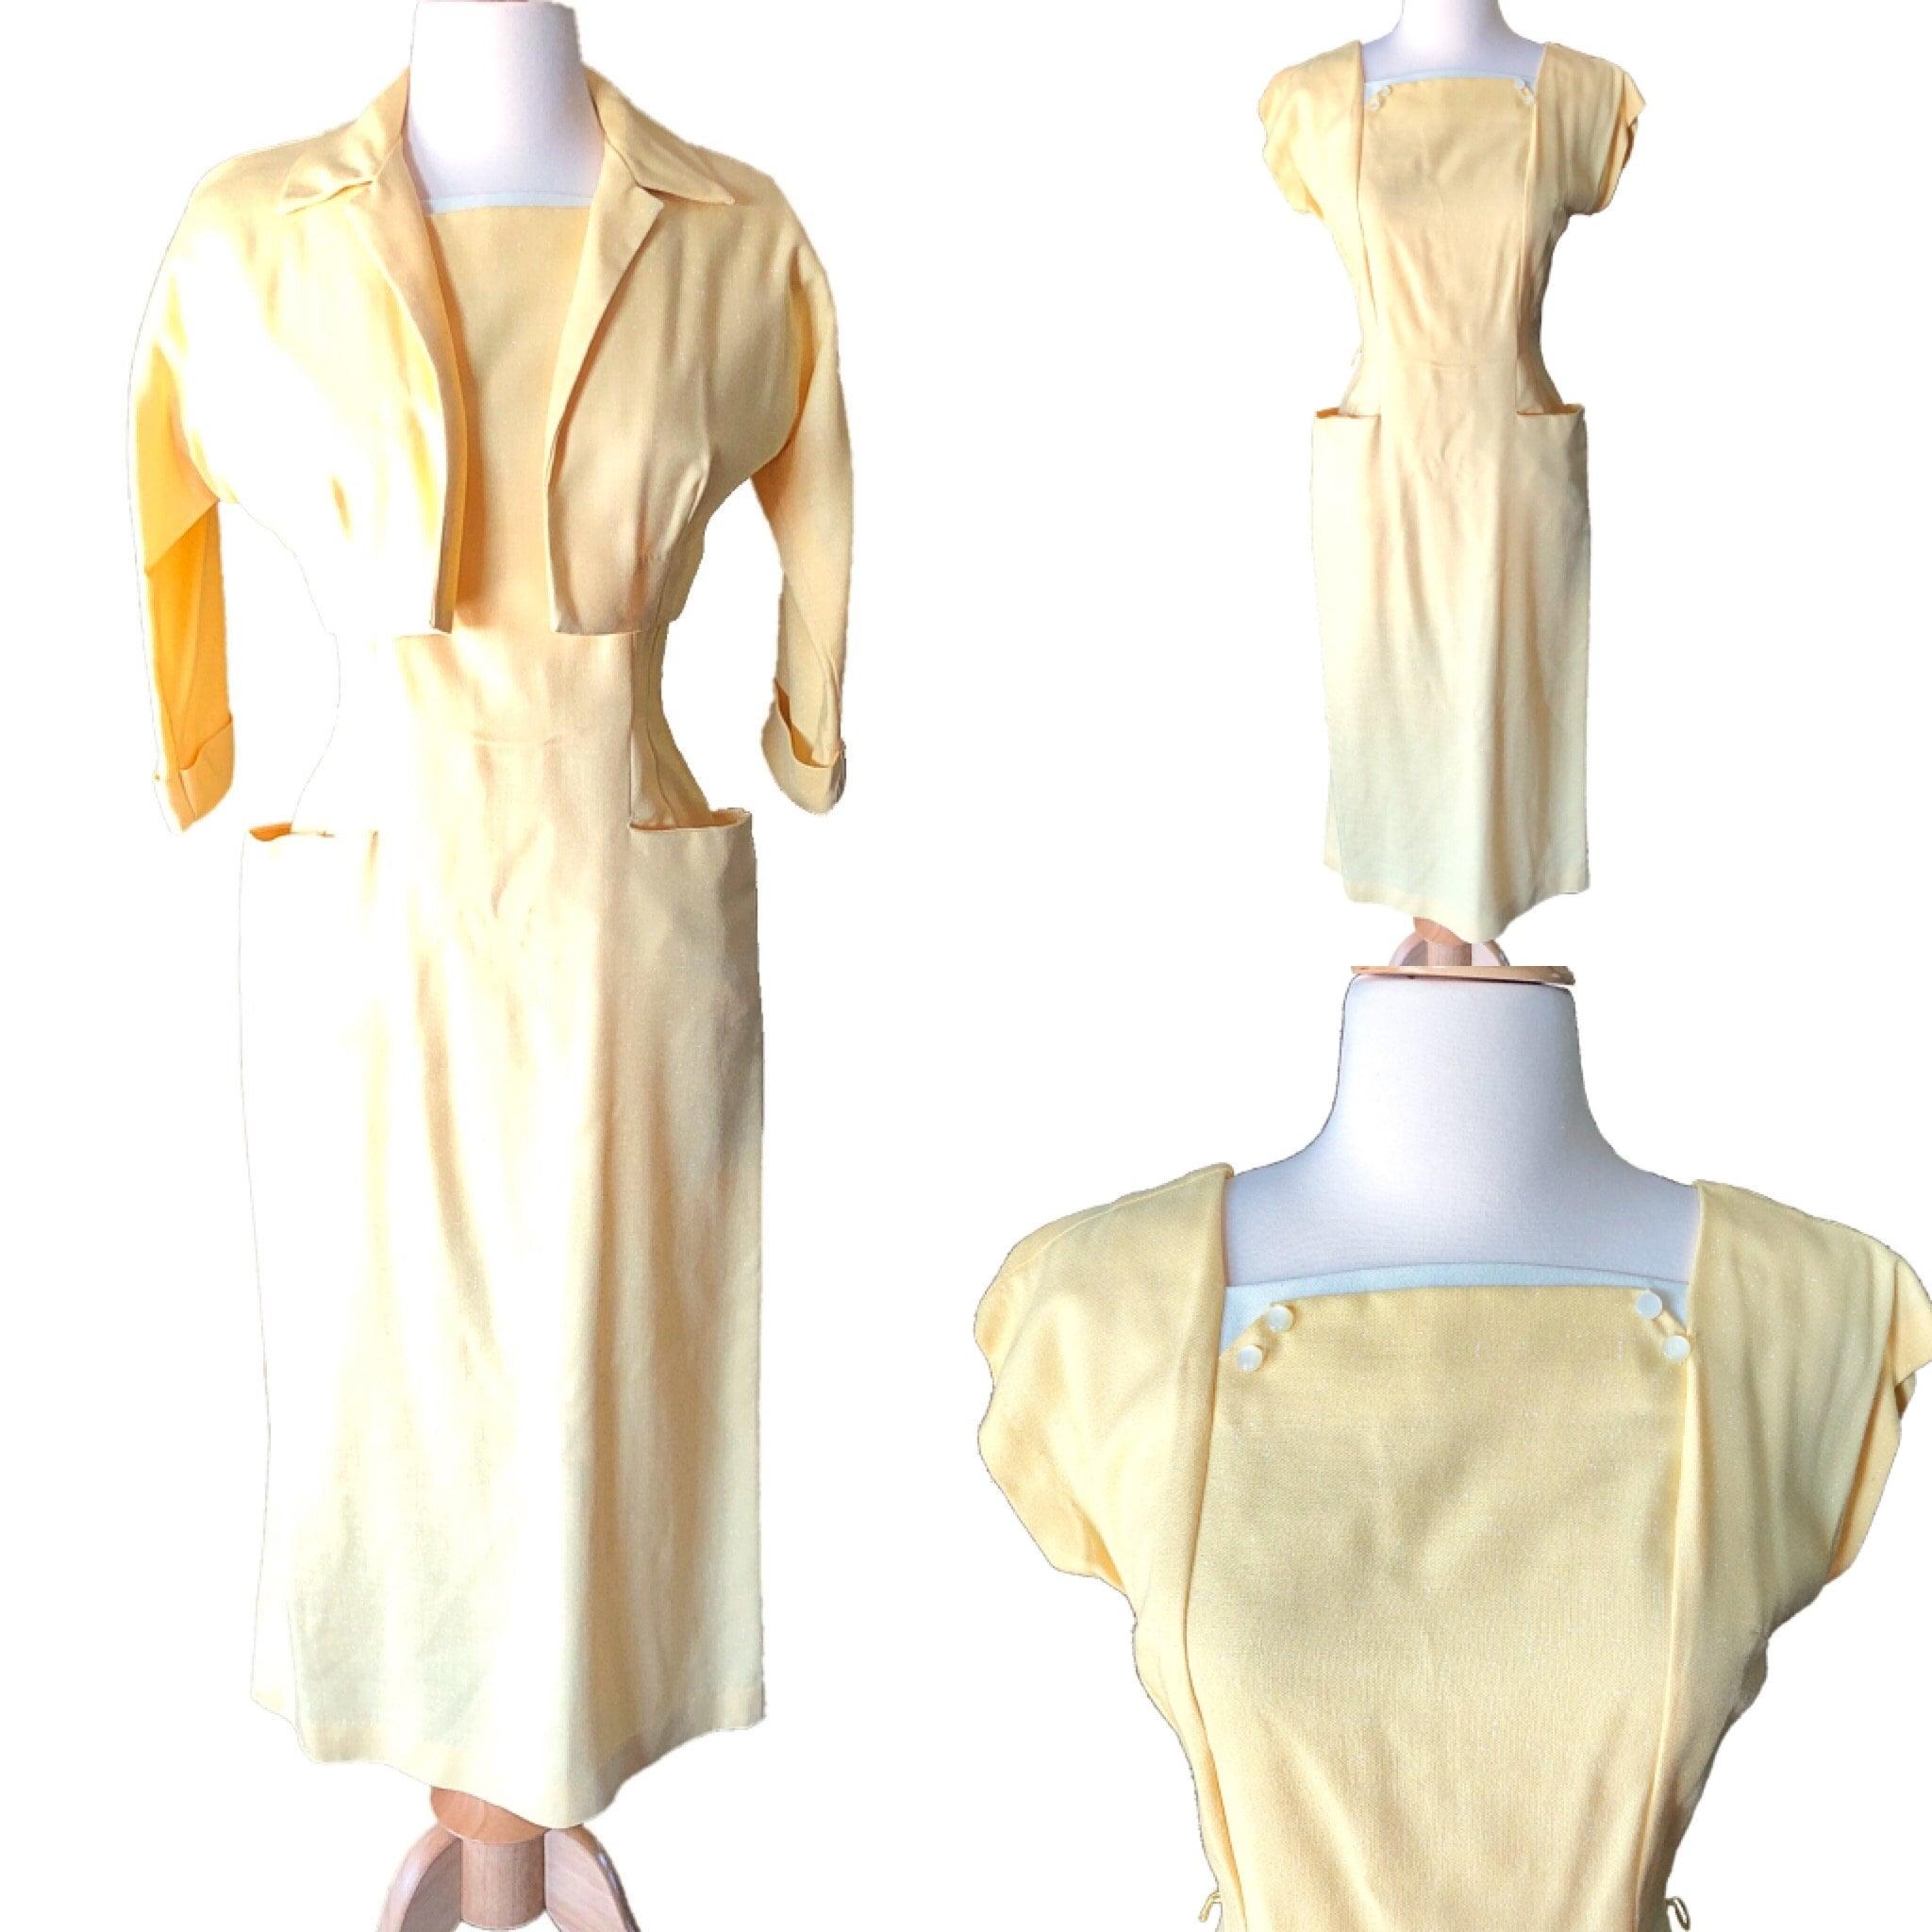 1950s Hats: Pillbox, Fascinator, Wedding, Sun Hats Vintage 1950S Wiggle Dress, Yellow  White, Matching Bolero Jacket, Size Small, Easter Pinup Fashion $0.00 AT vintagedancer.com